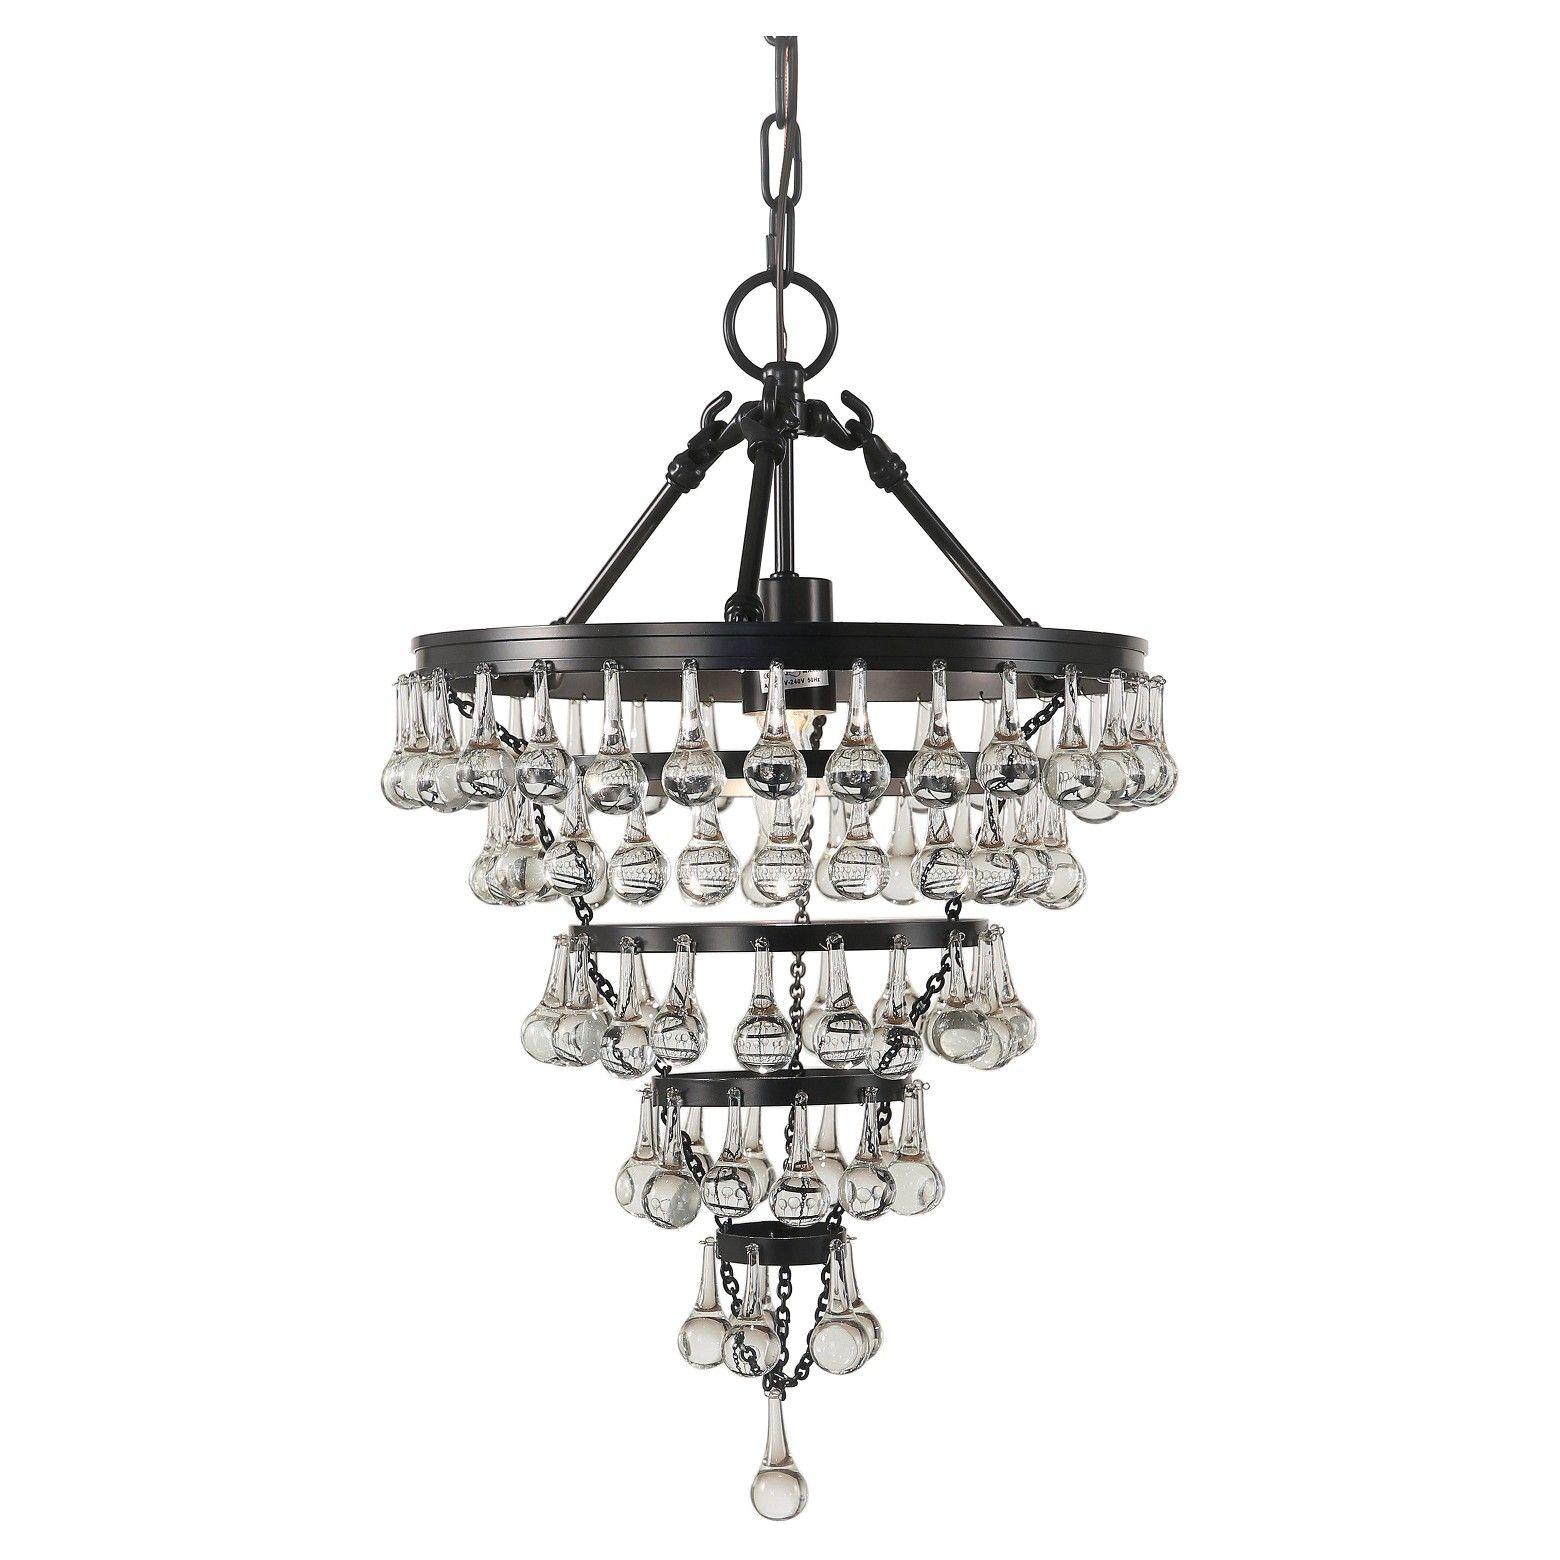 Claire crystal tear drop chandelier abbyson gray chandeliers claire crystal tear drop chandelier abbyson gray arubaitofo Images